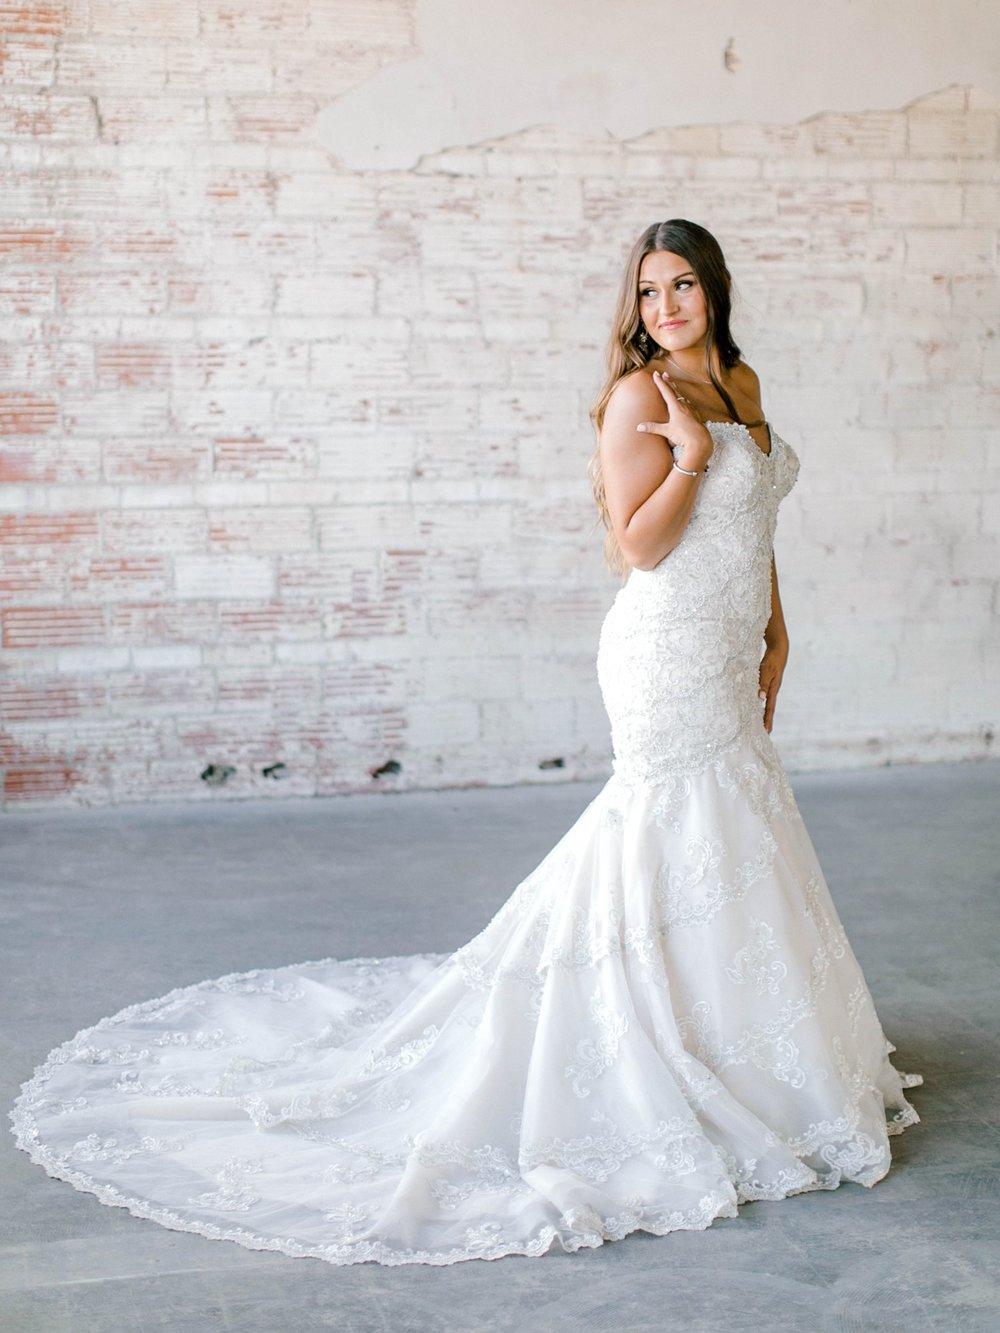 Kendra_Hill_Bridals_ALLEEJ_Lubbock_Wedding_Photographer_LHUCA_0012.jpg